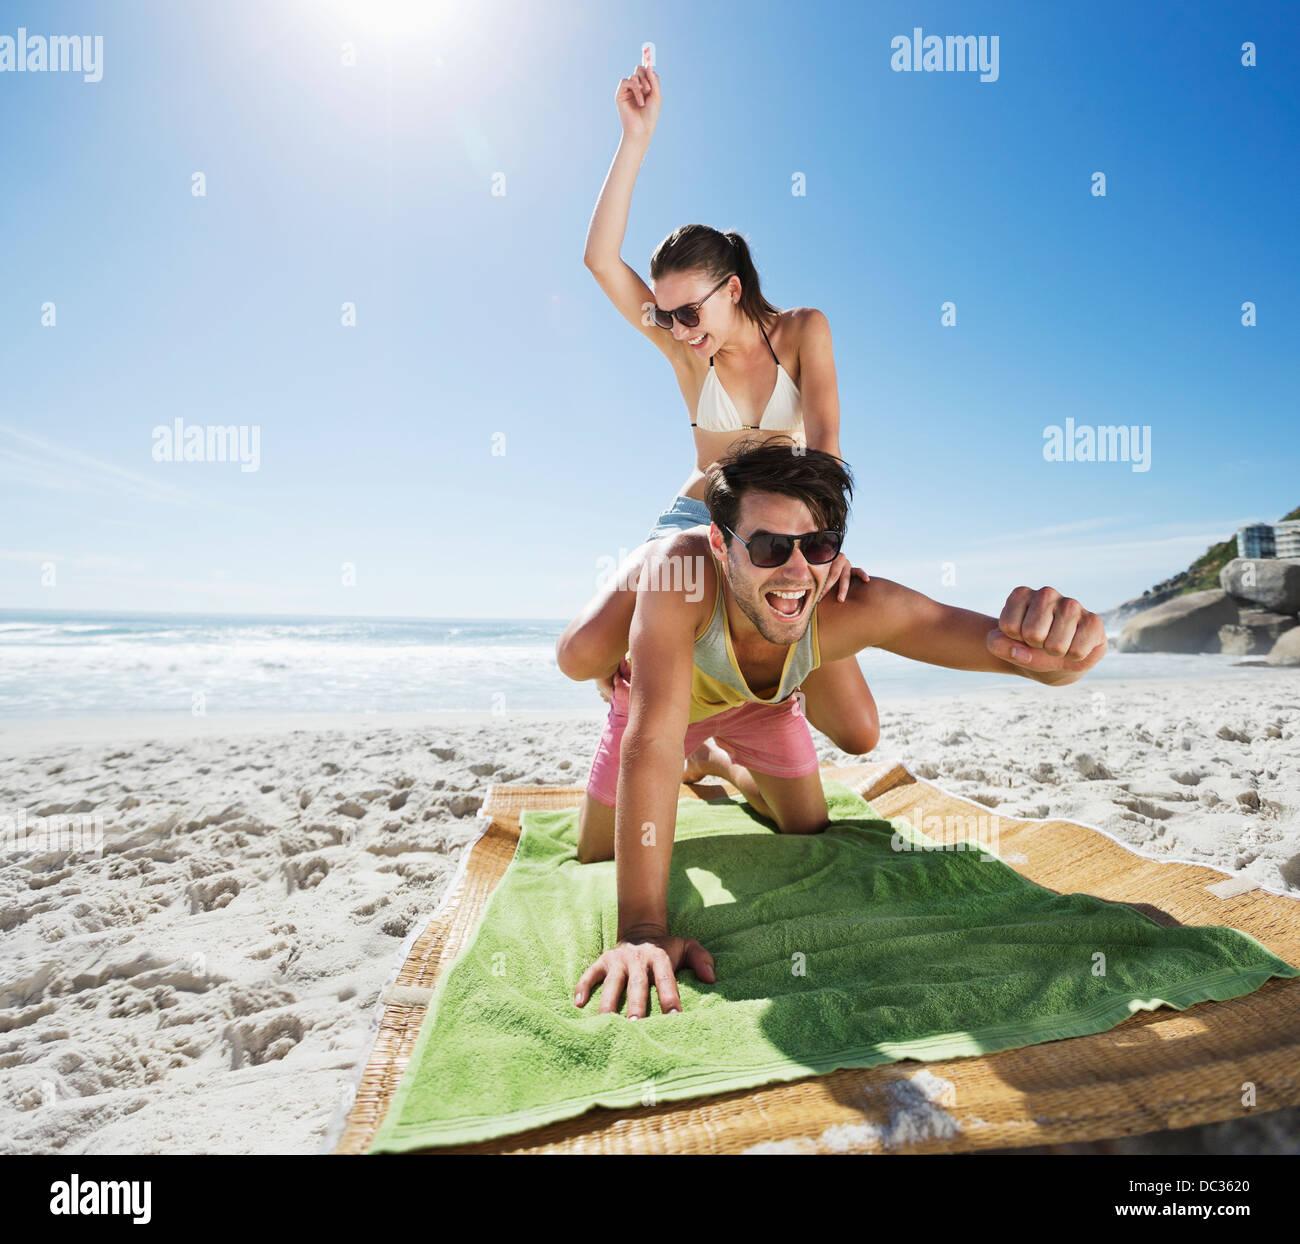 Woman piggybacking enthusiastic man on beach - Stock Image